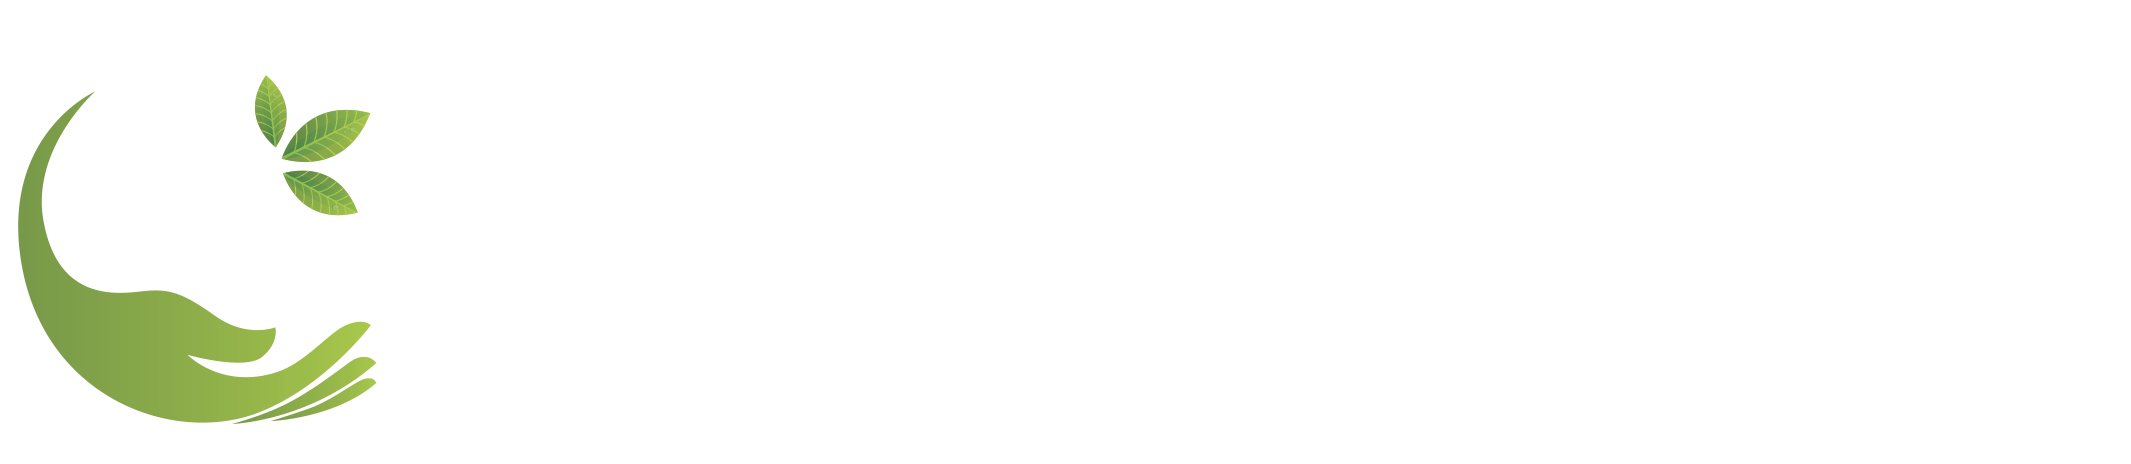 Eskeriina